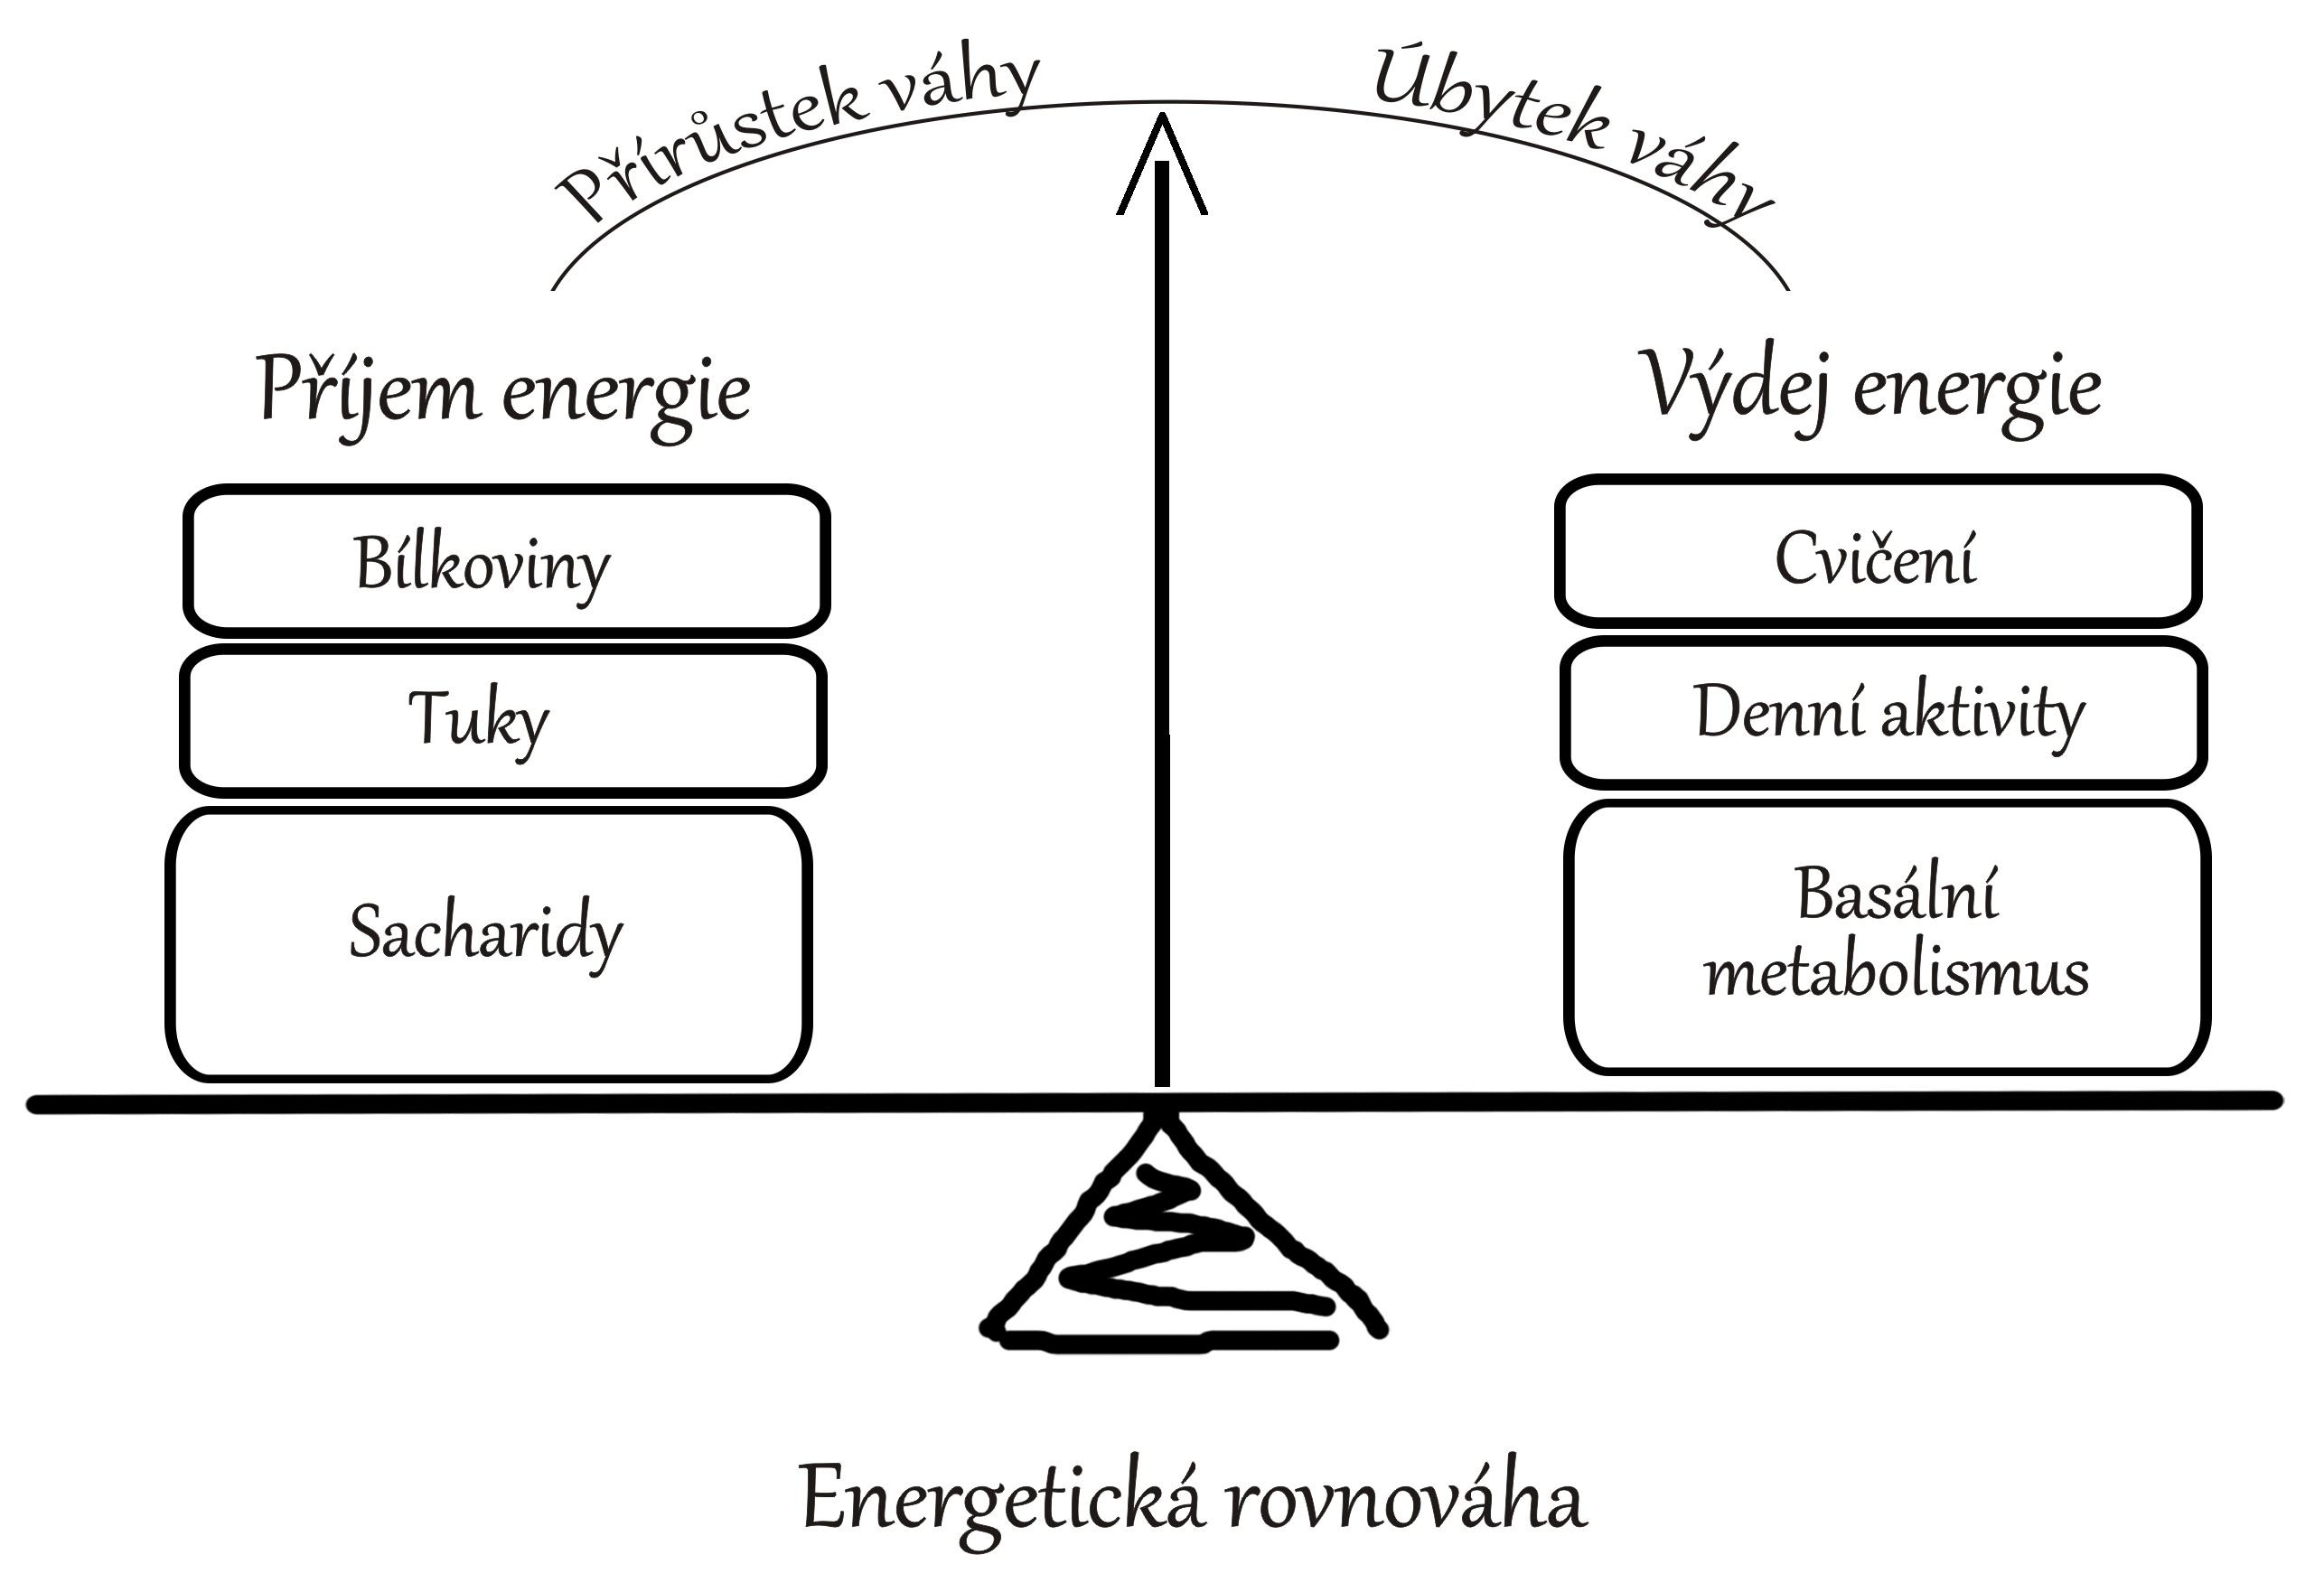 Energetická rovnováha